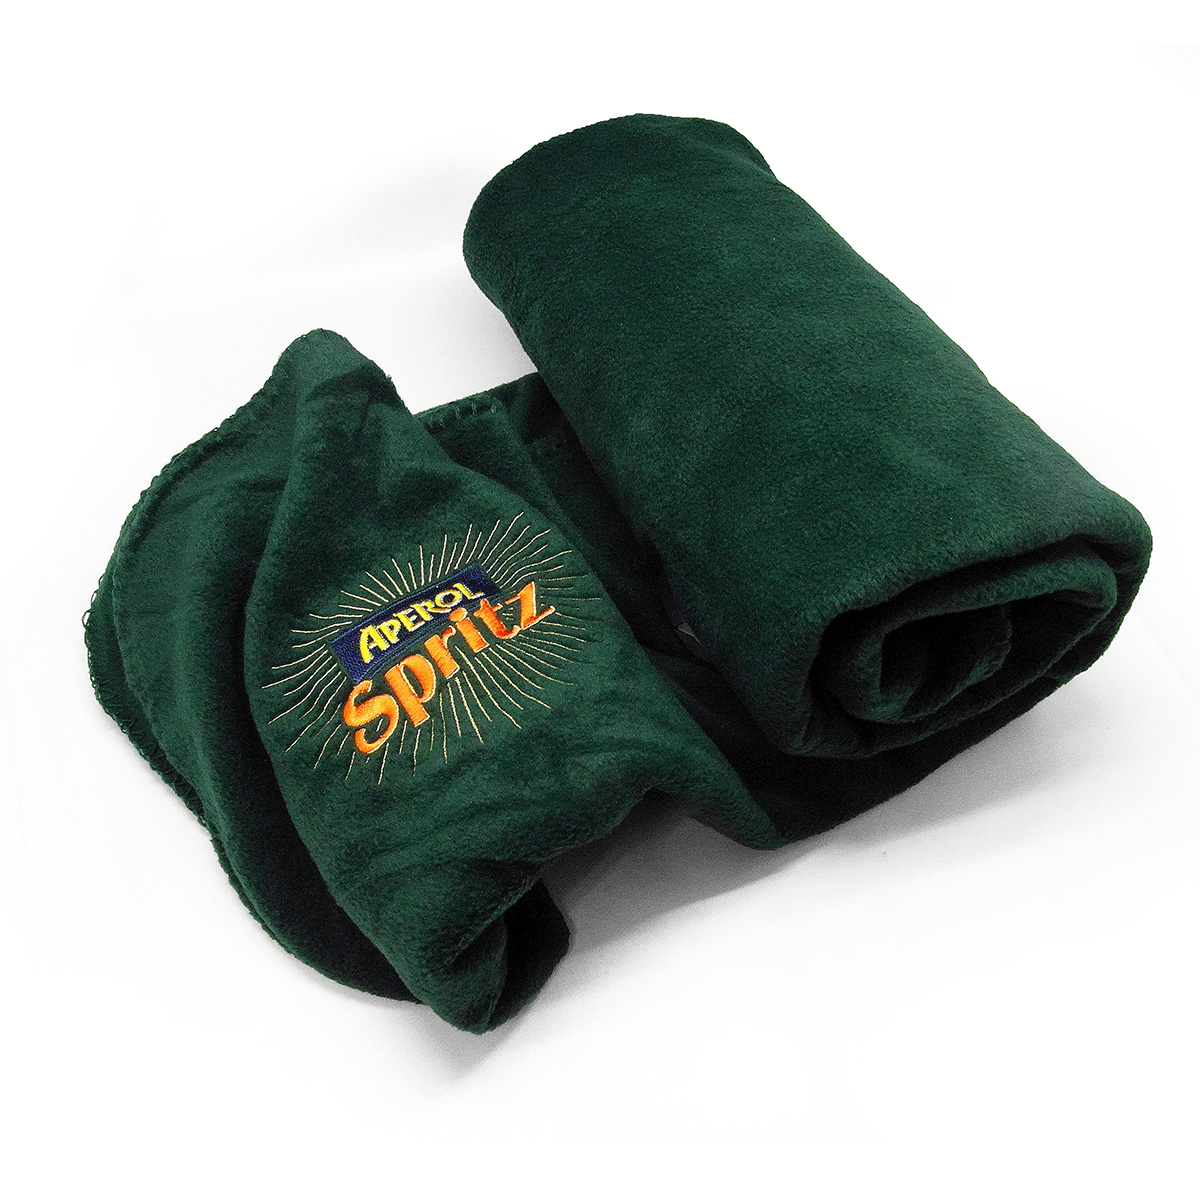 coperta-aperol-spritz